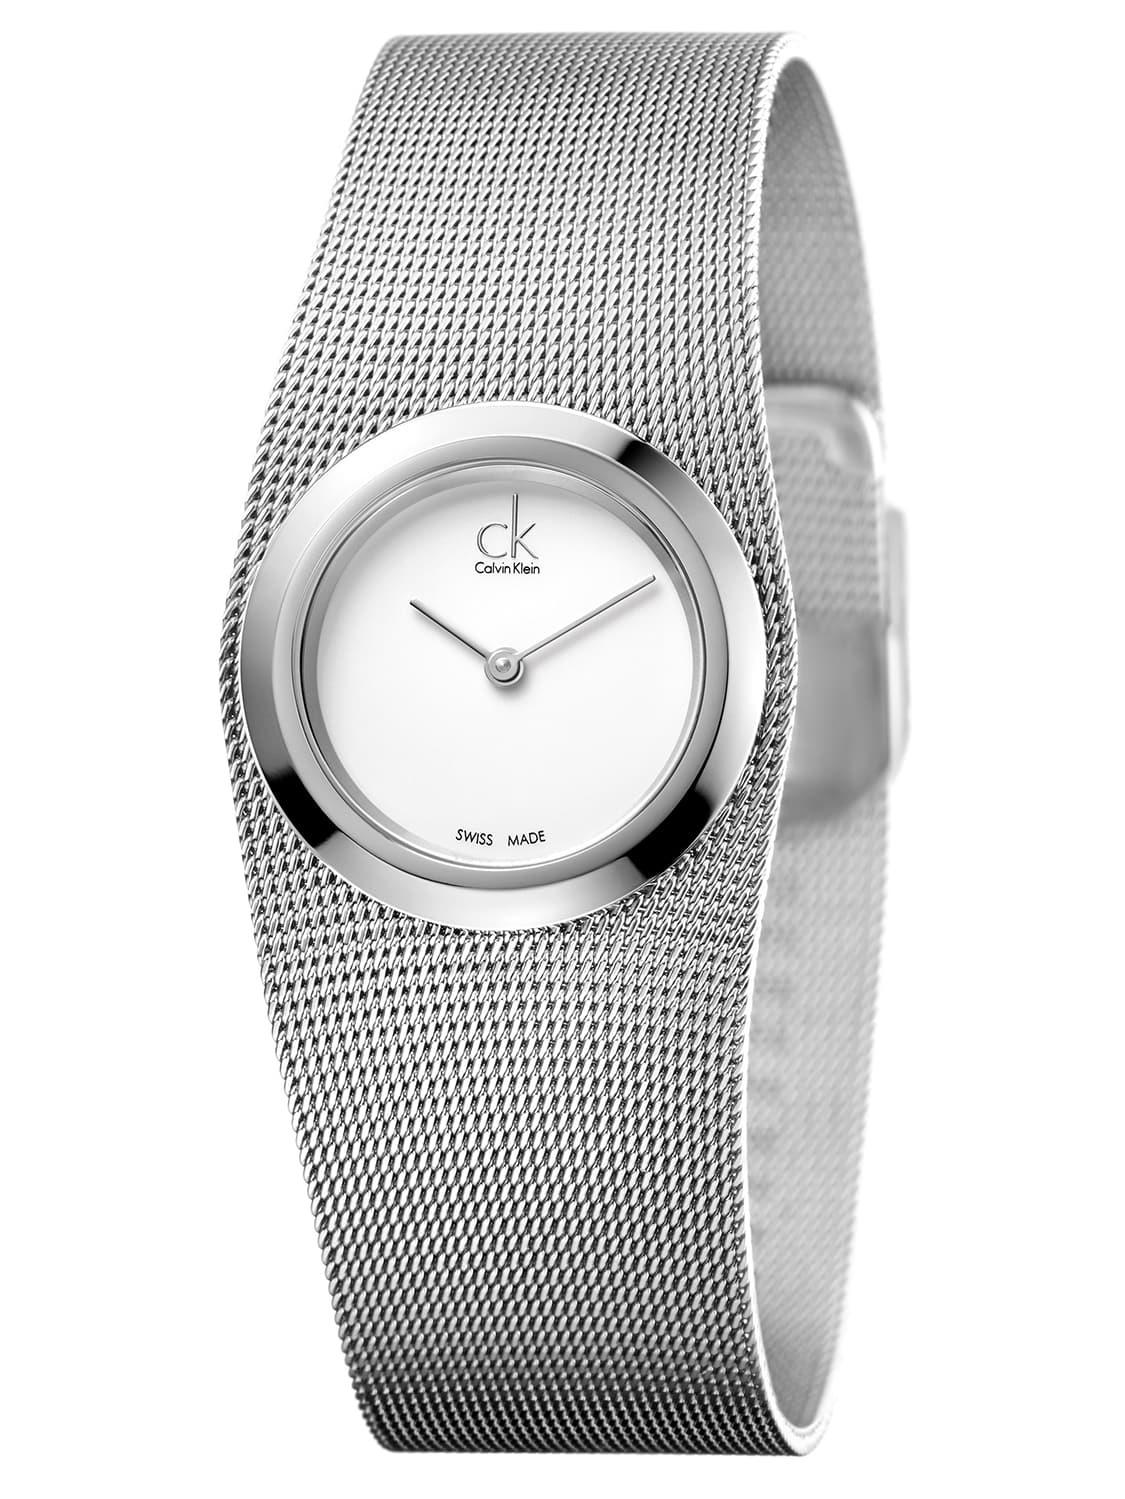 Women's Impulsive Stainless Steel Silver Swiss Quartz (Battery-Powered) Watch